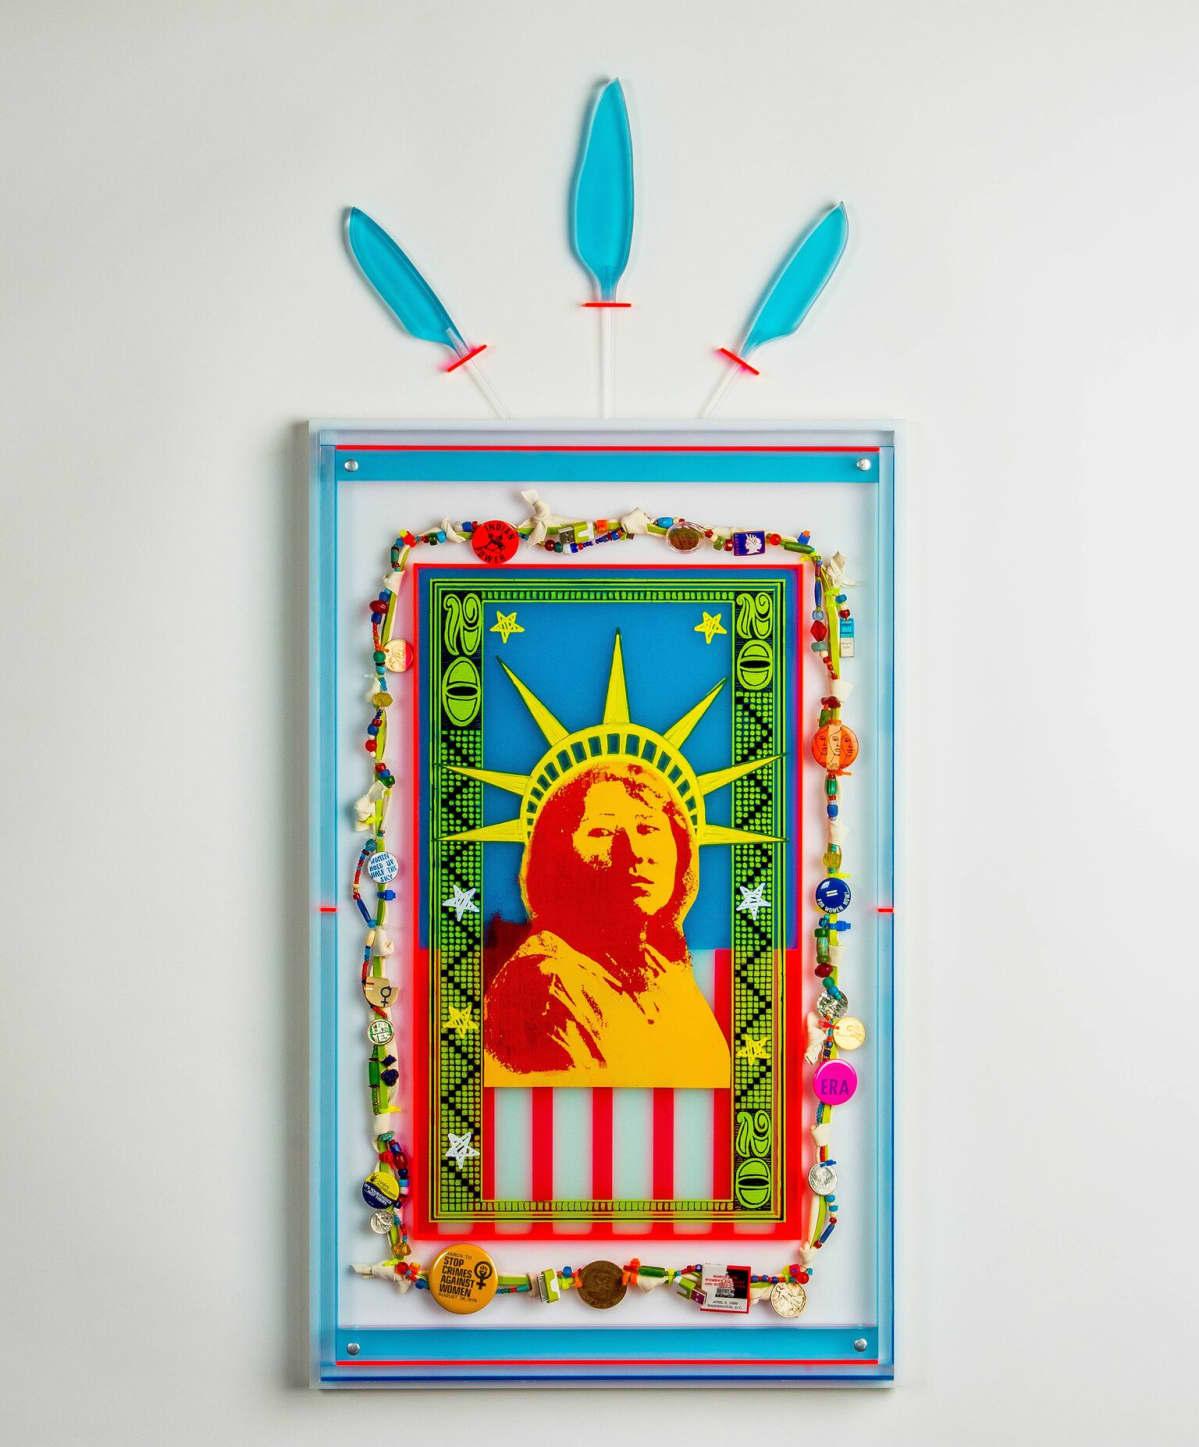 Rebecca Lyon, Counting on Liberty (2016).